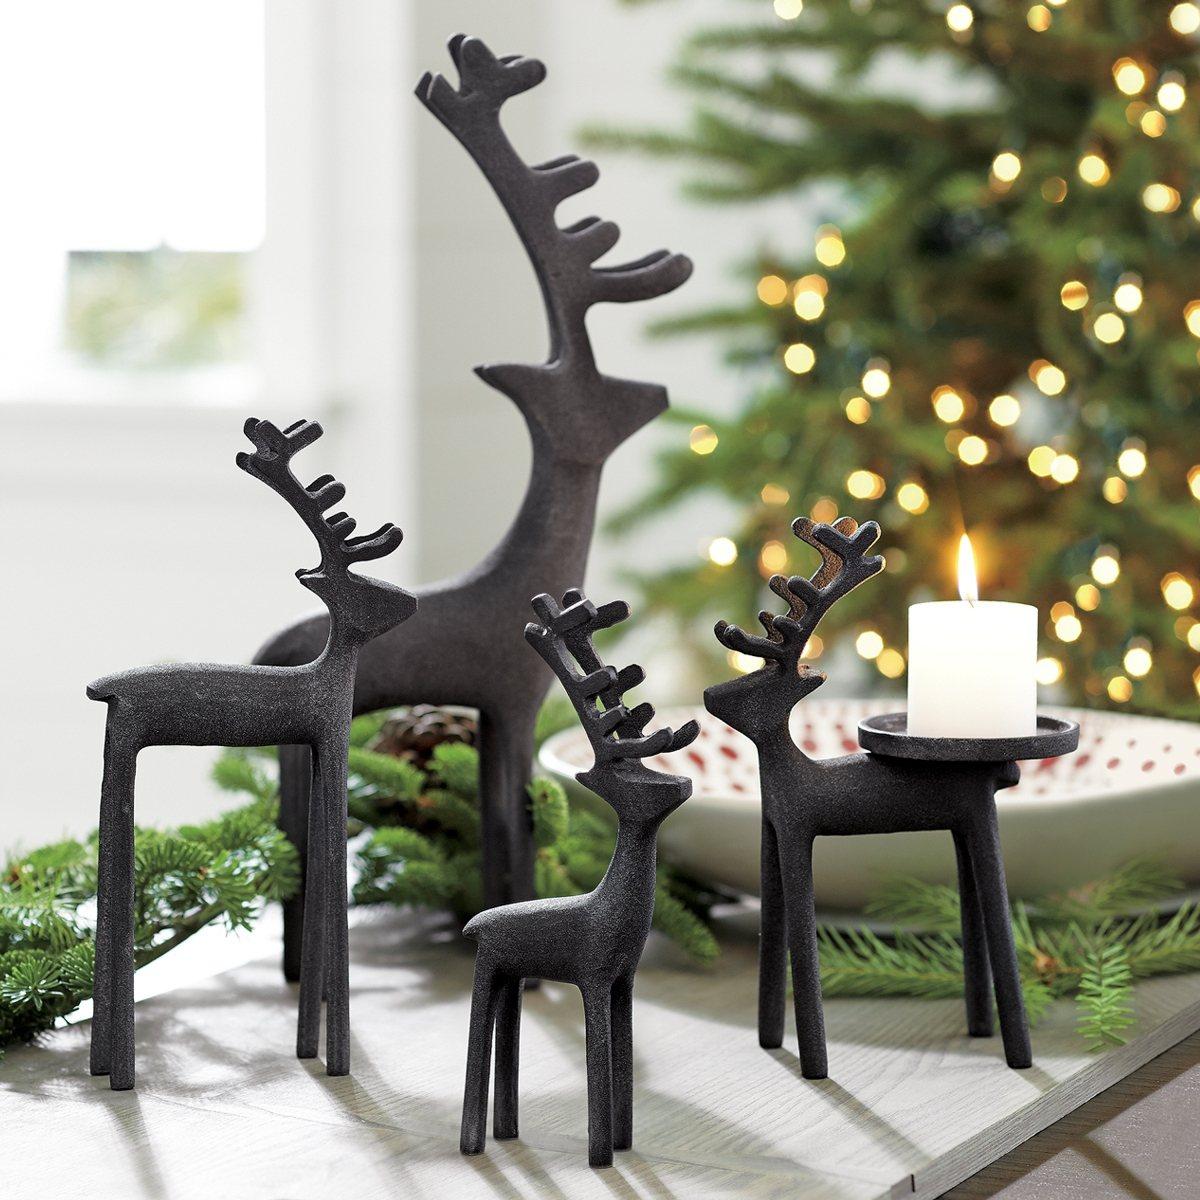 Zinc馴鹿擺飾及Reindeer燭台。圖/Crate and Barrel提供